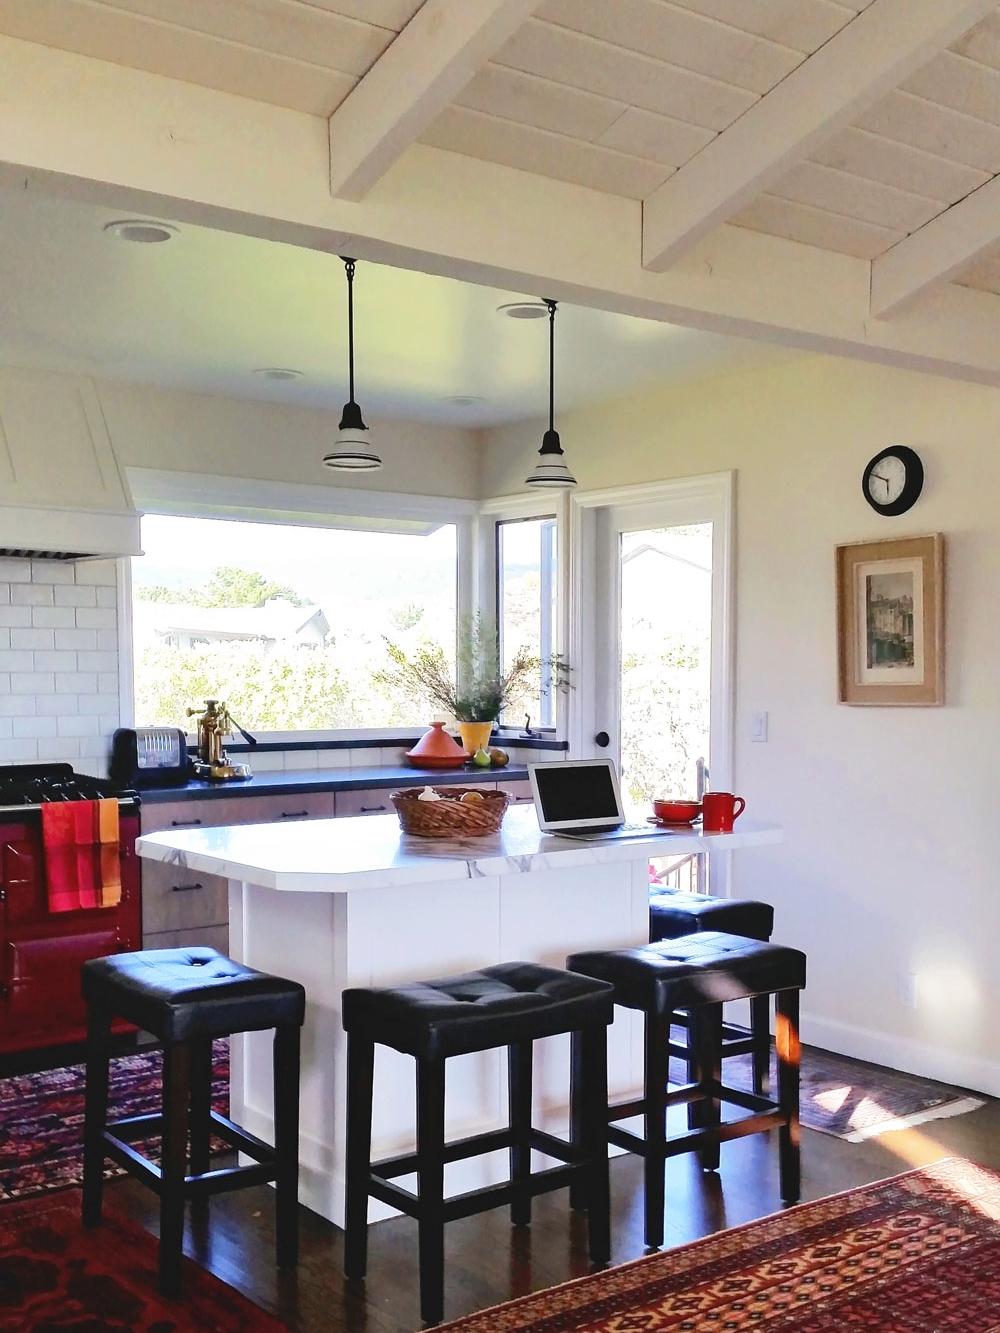 3-vaulted-island-ceiling-beamed-dee-carawan-kitchen.jpg